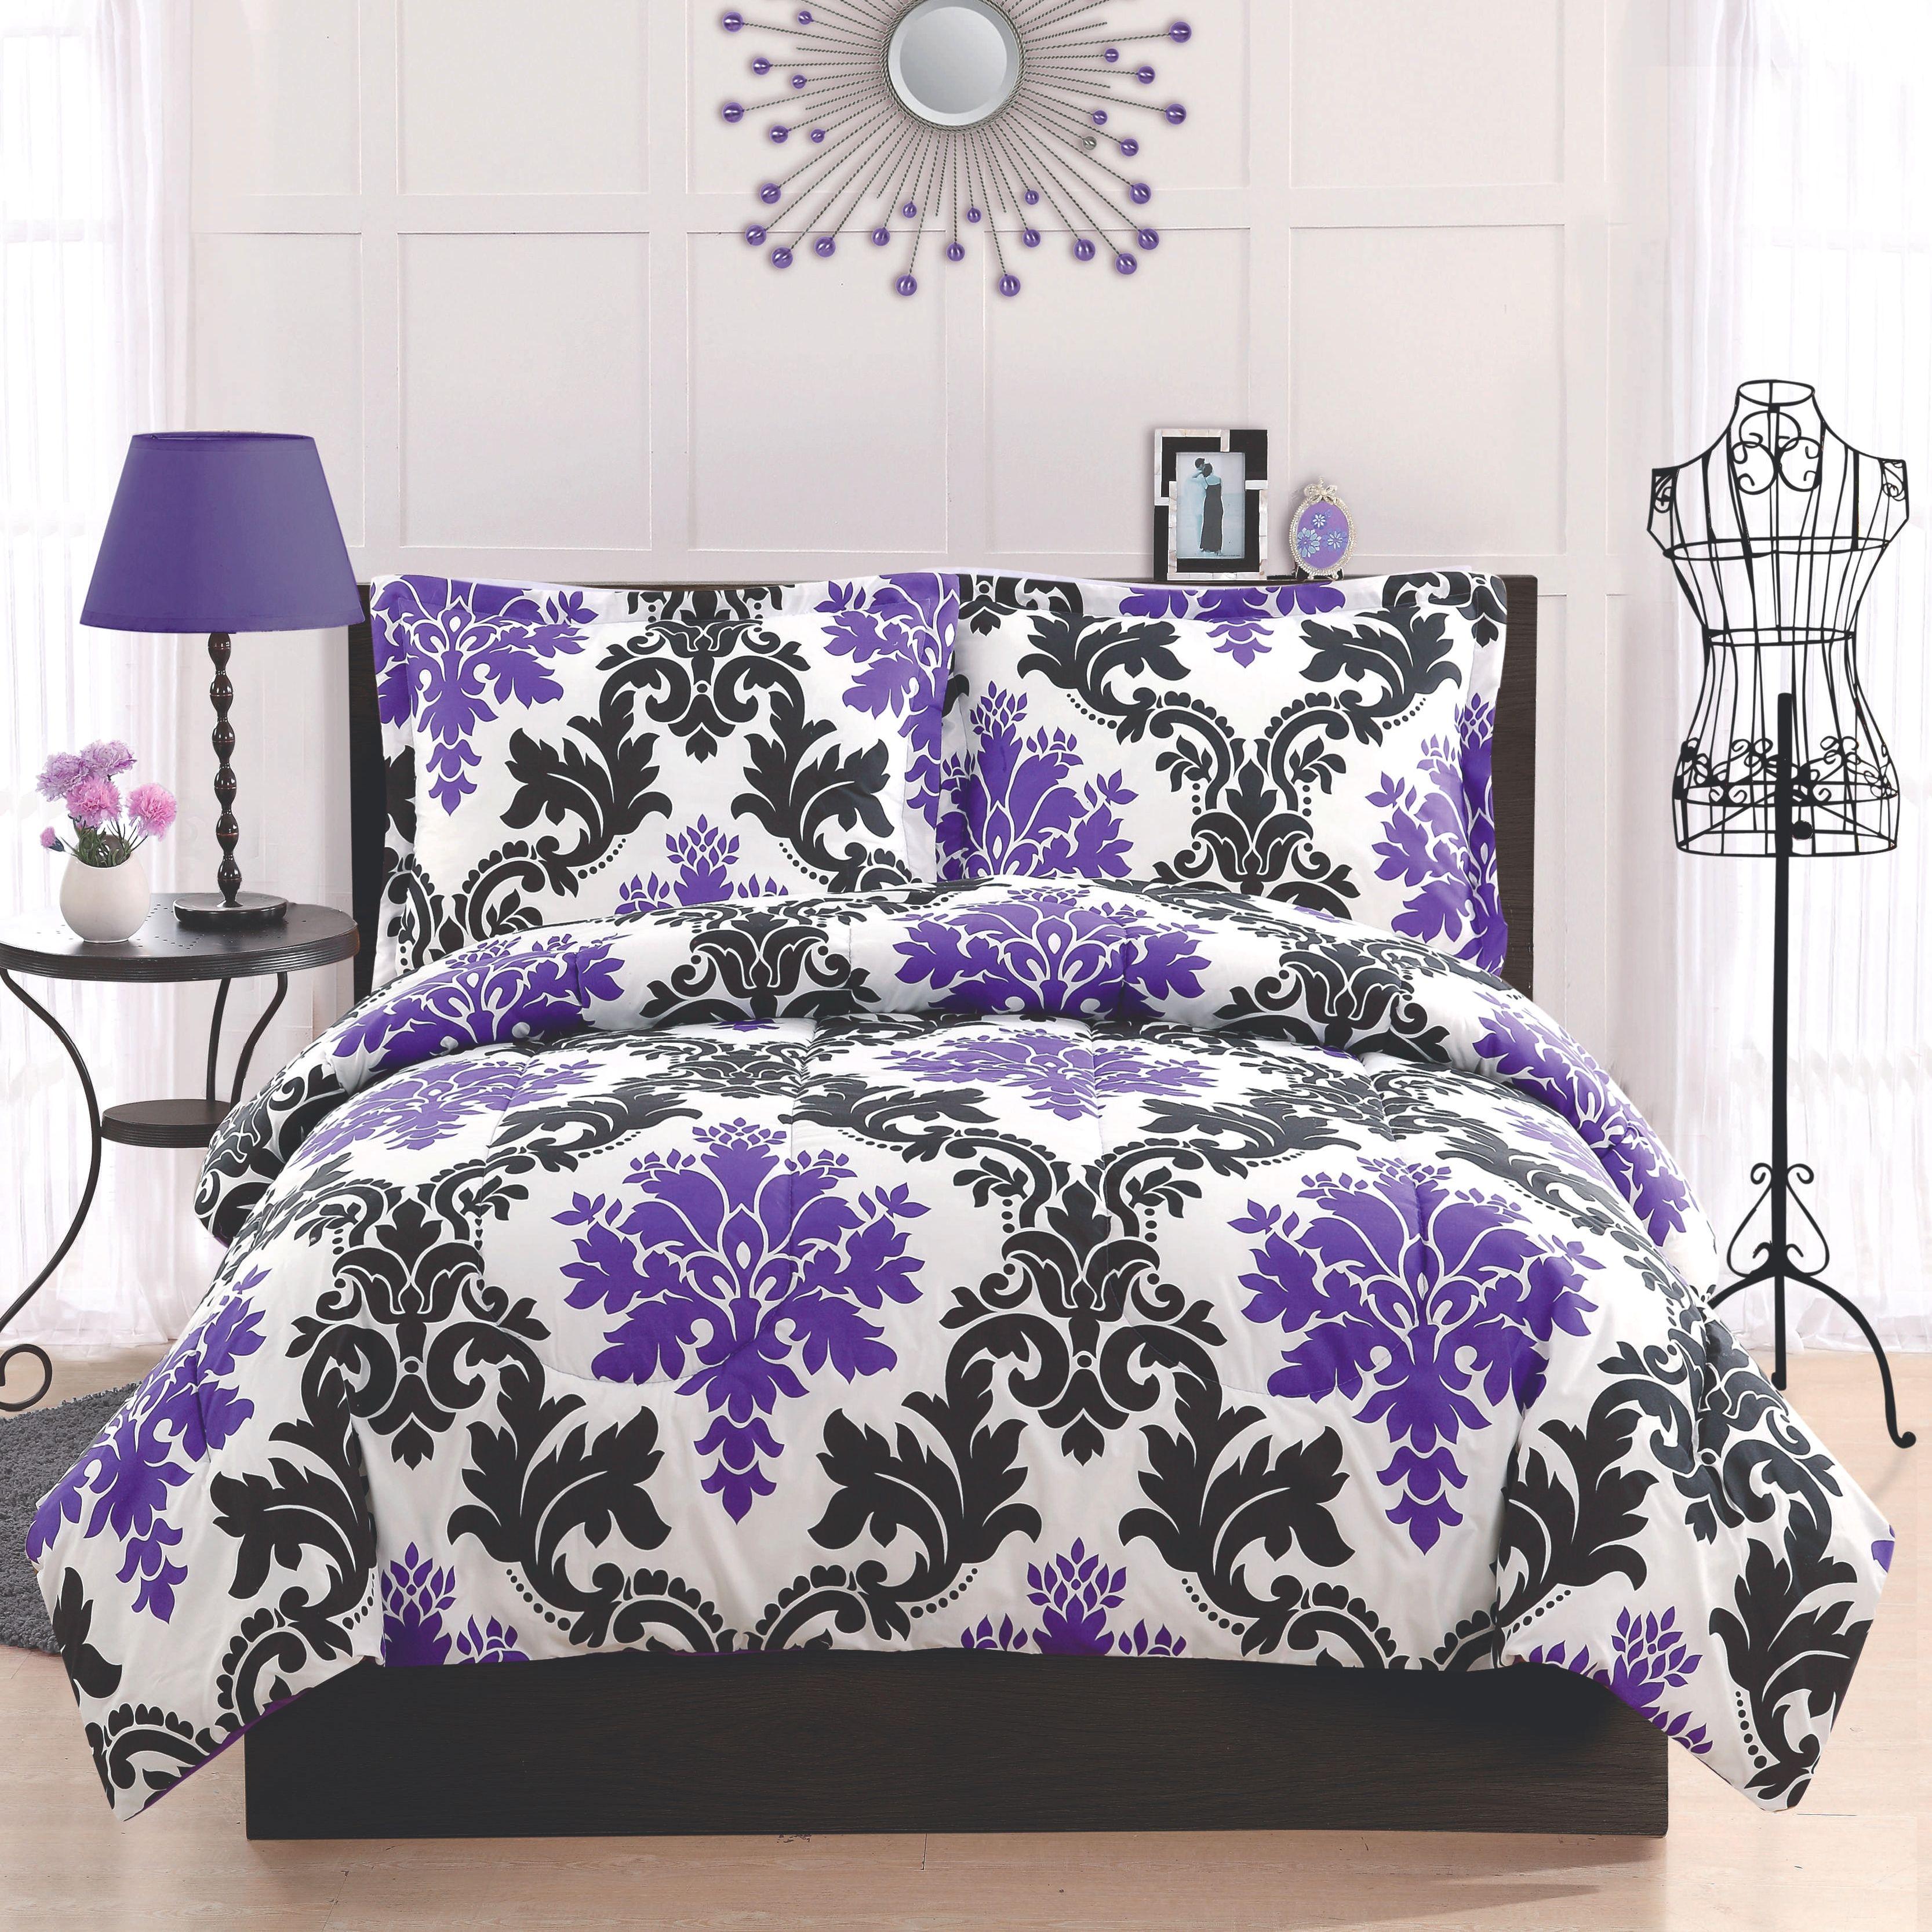 Black and purple bed sheets - Black White And Purple Damask Bedding Dorm Bedding Teen Bedding Damask Bedding